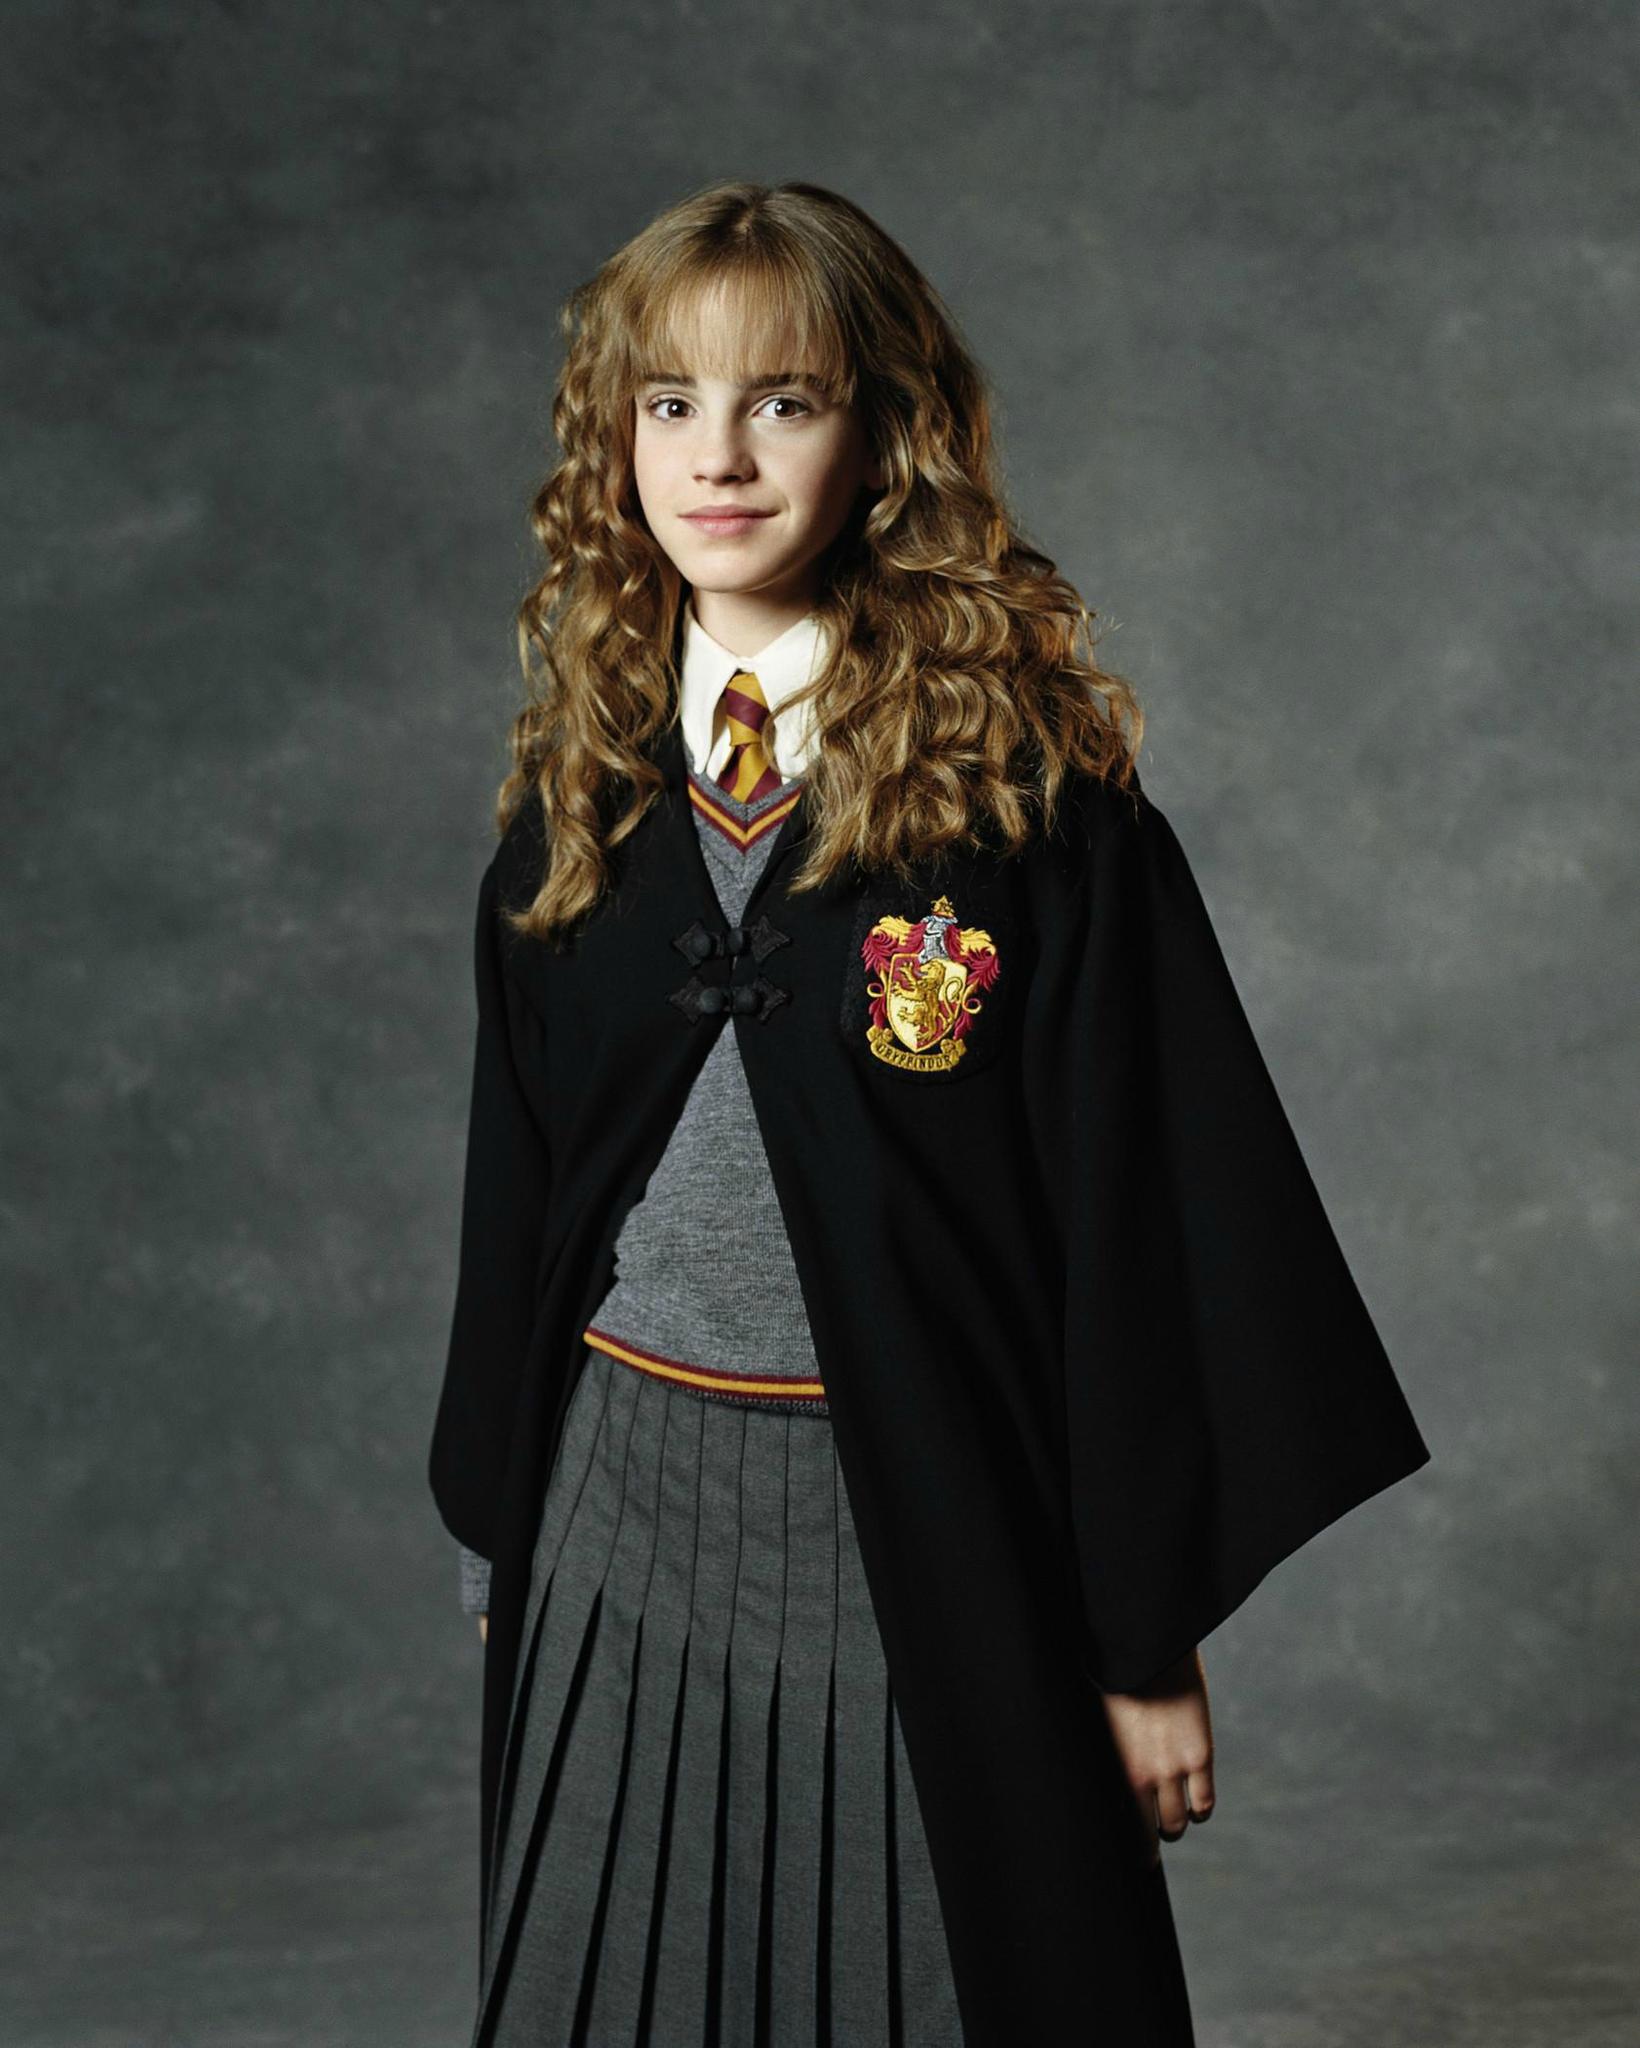 Coloriage Hermione A Imprimer.Coloriage Hermione Gryffondor A Imprimer